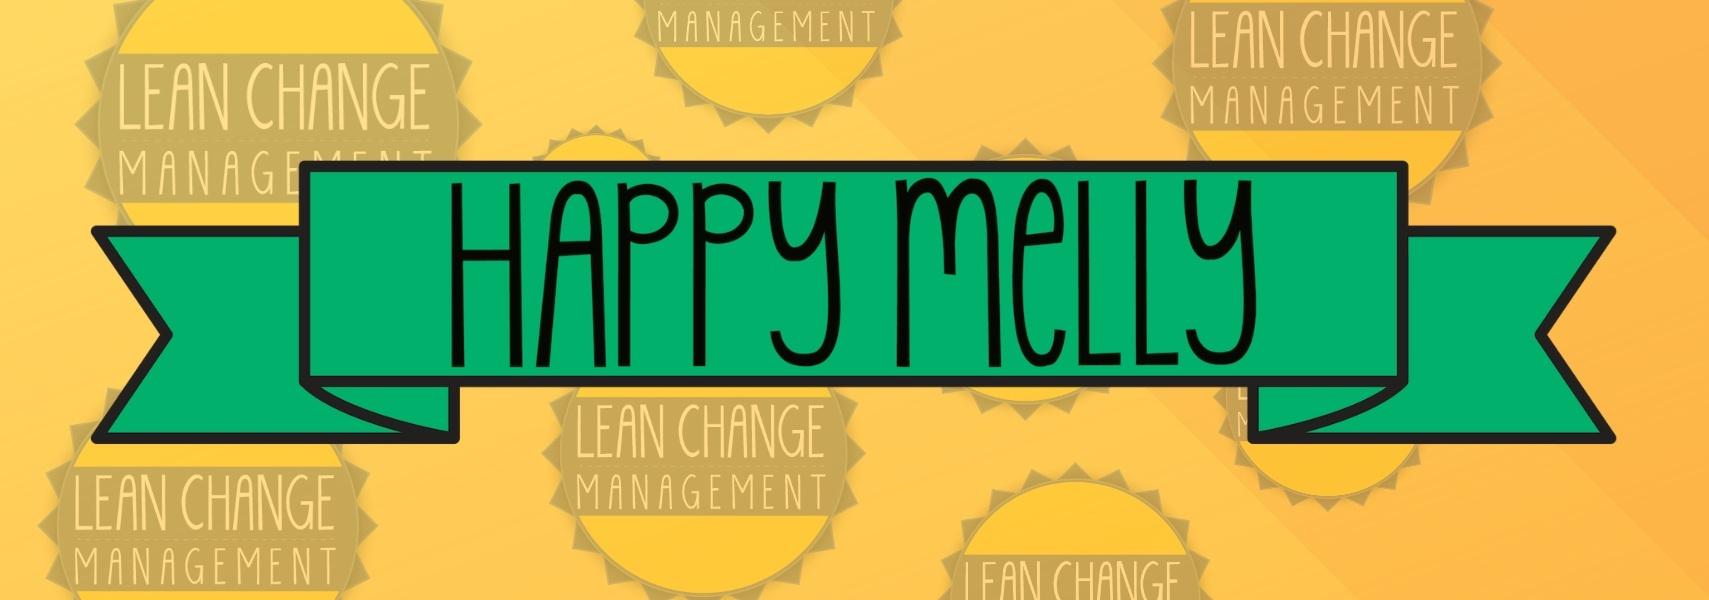 Lean Change Management Badge.jpg